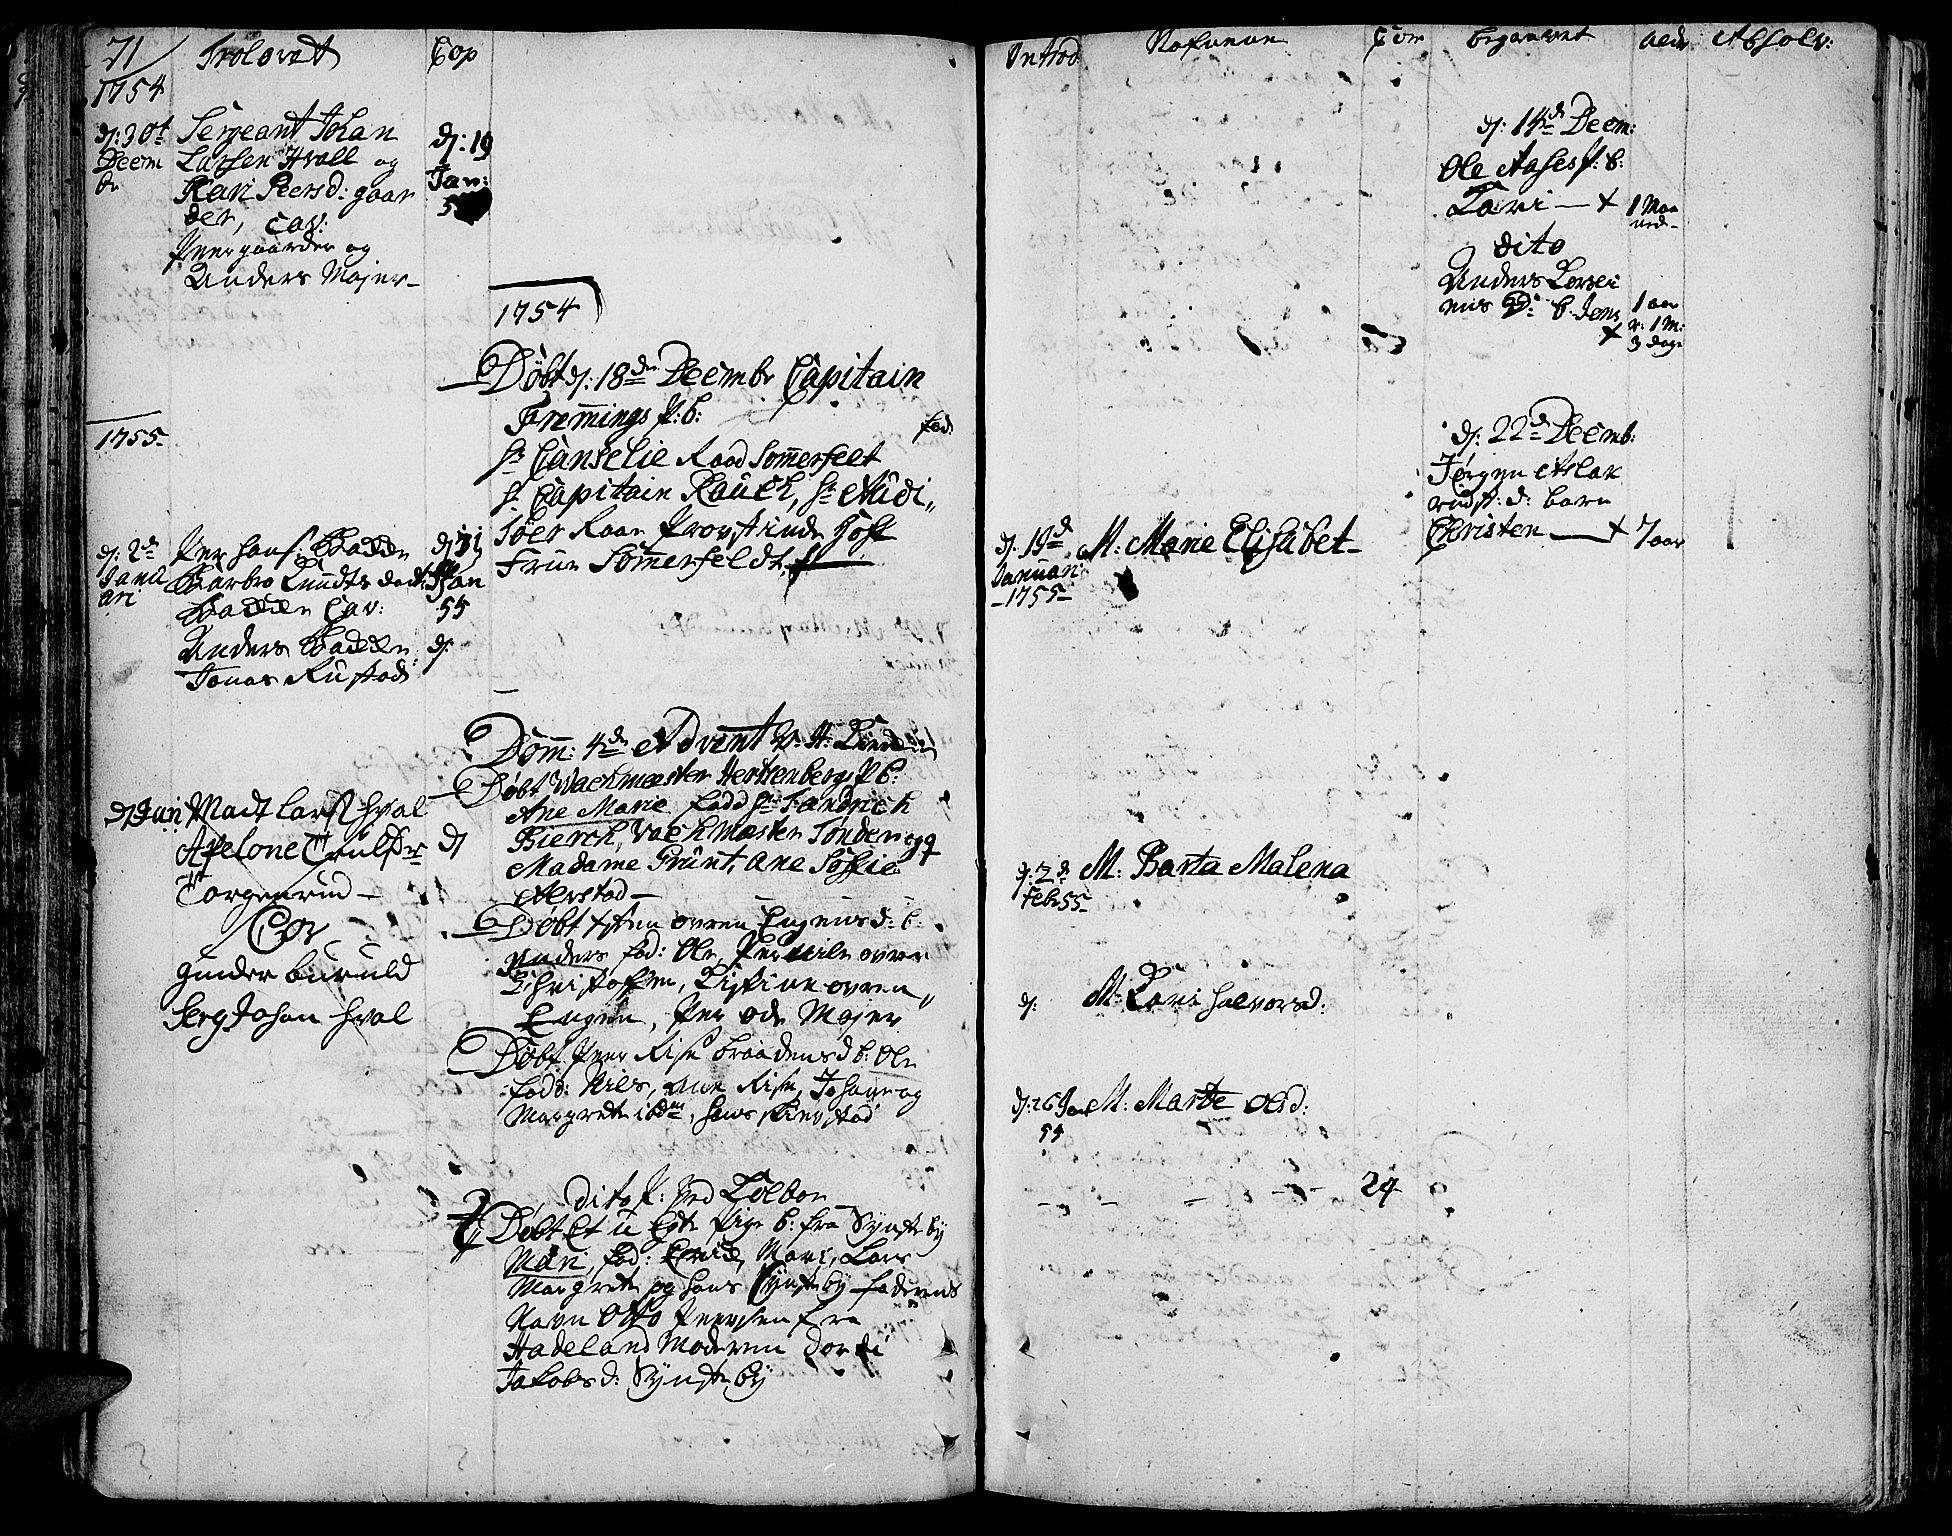 SAH, Toten prestekontor, Ministerialbok nr. 4, 1751-1761, s. 71